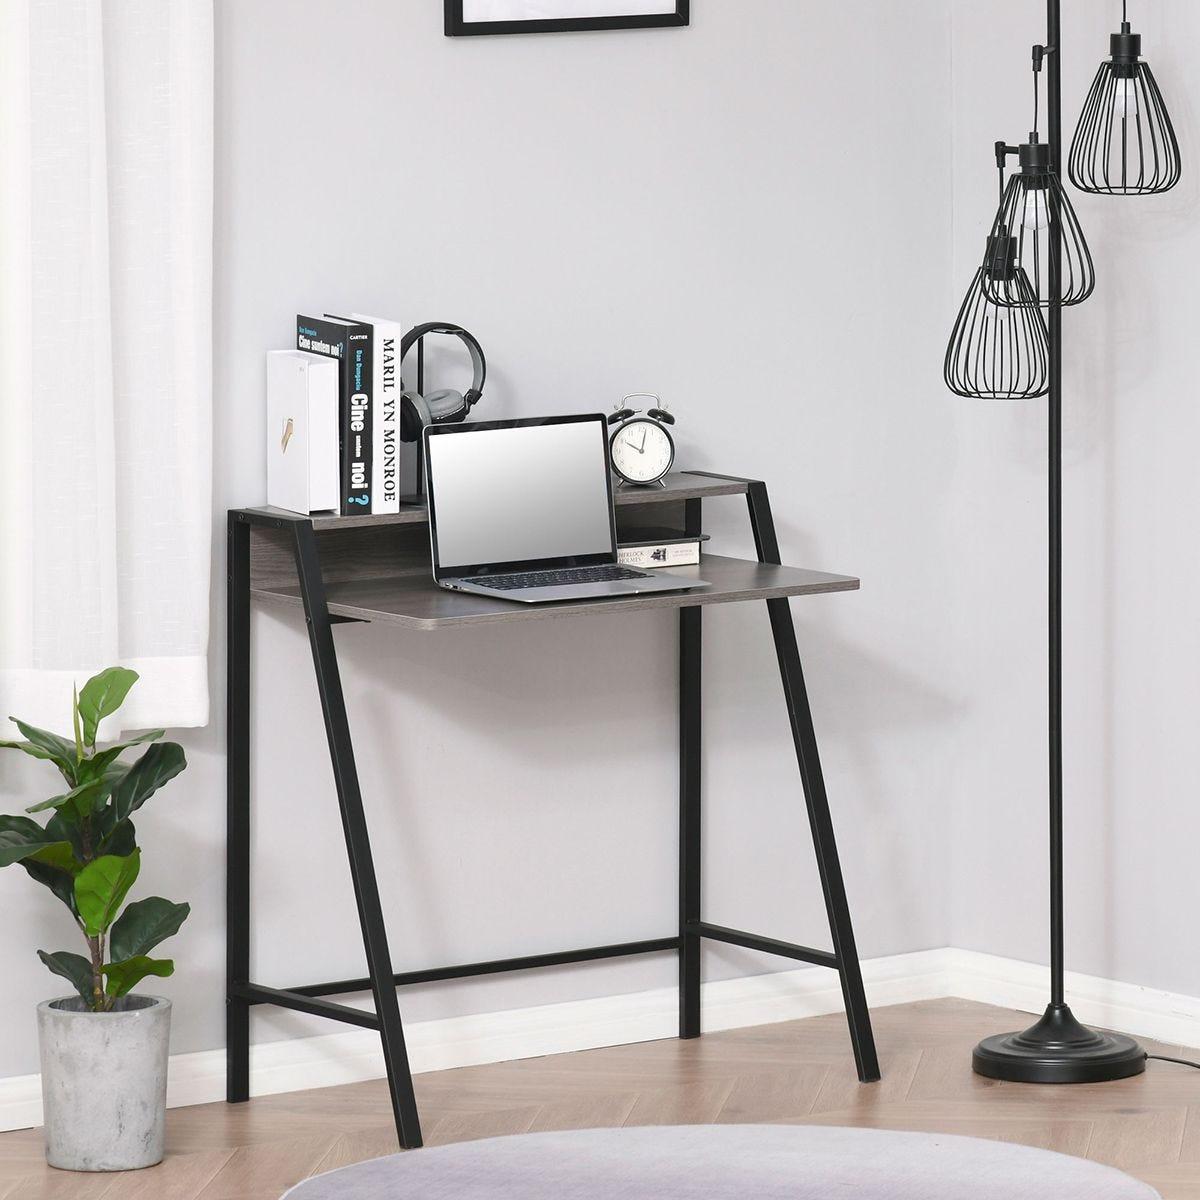 2 Tier Workstation Computer Desk With Storage Shelf Black Grey